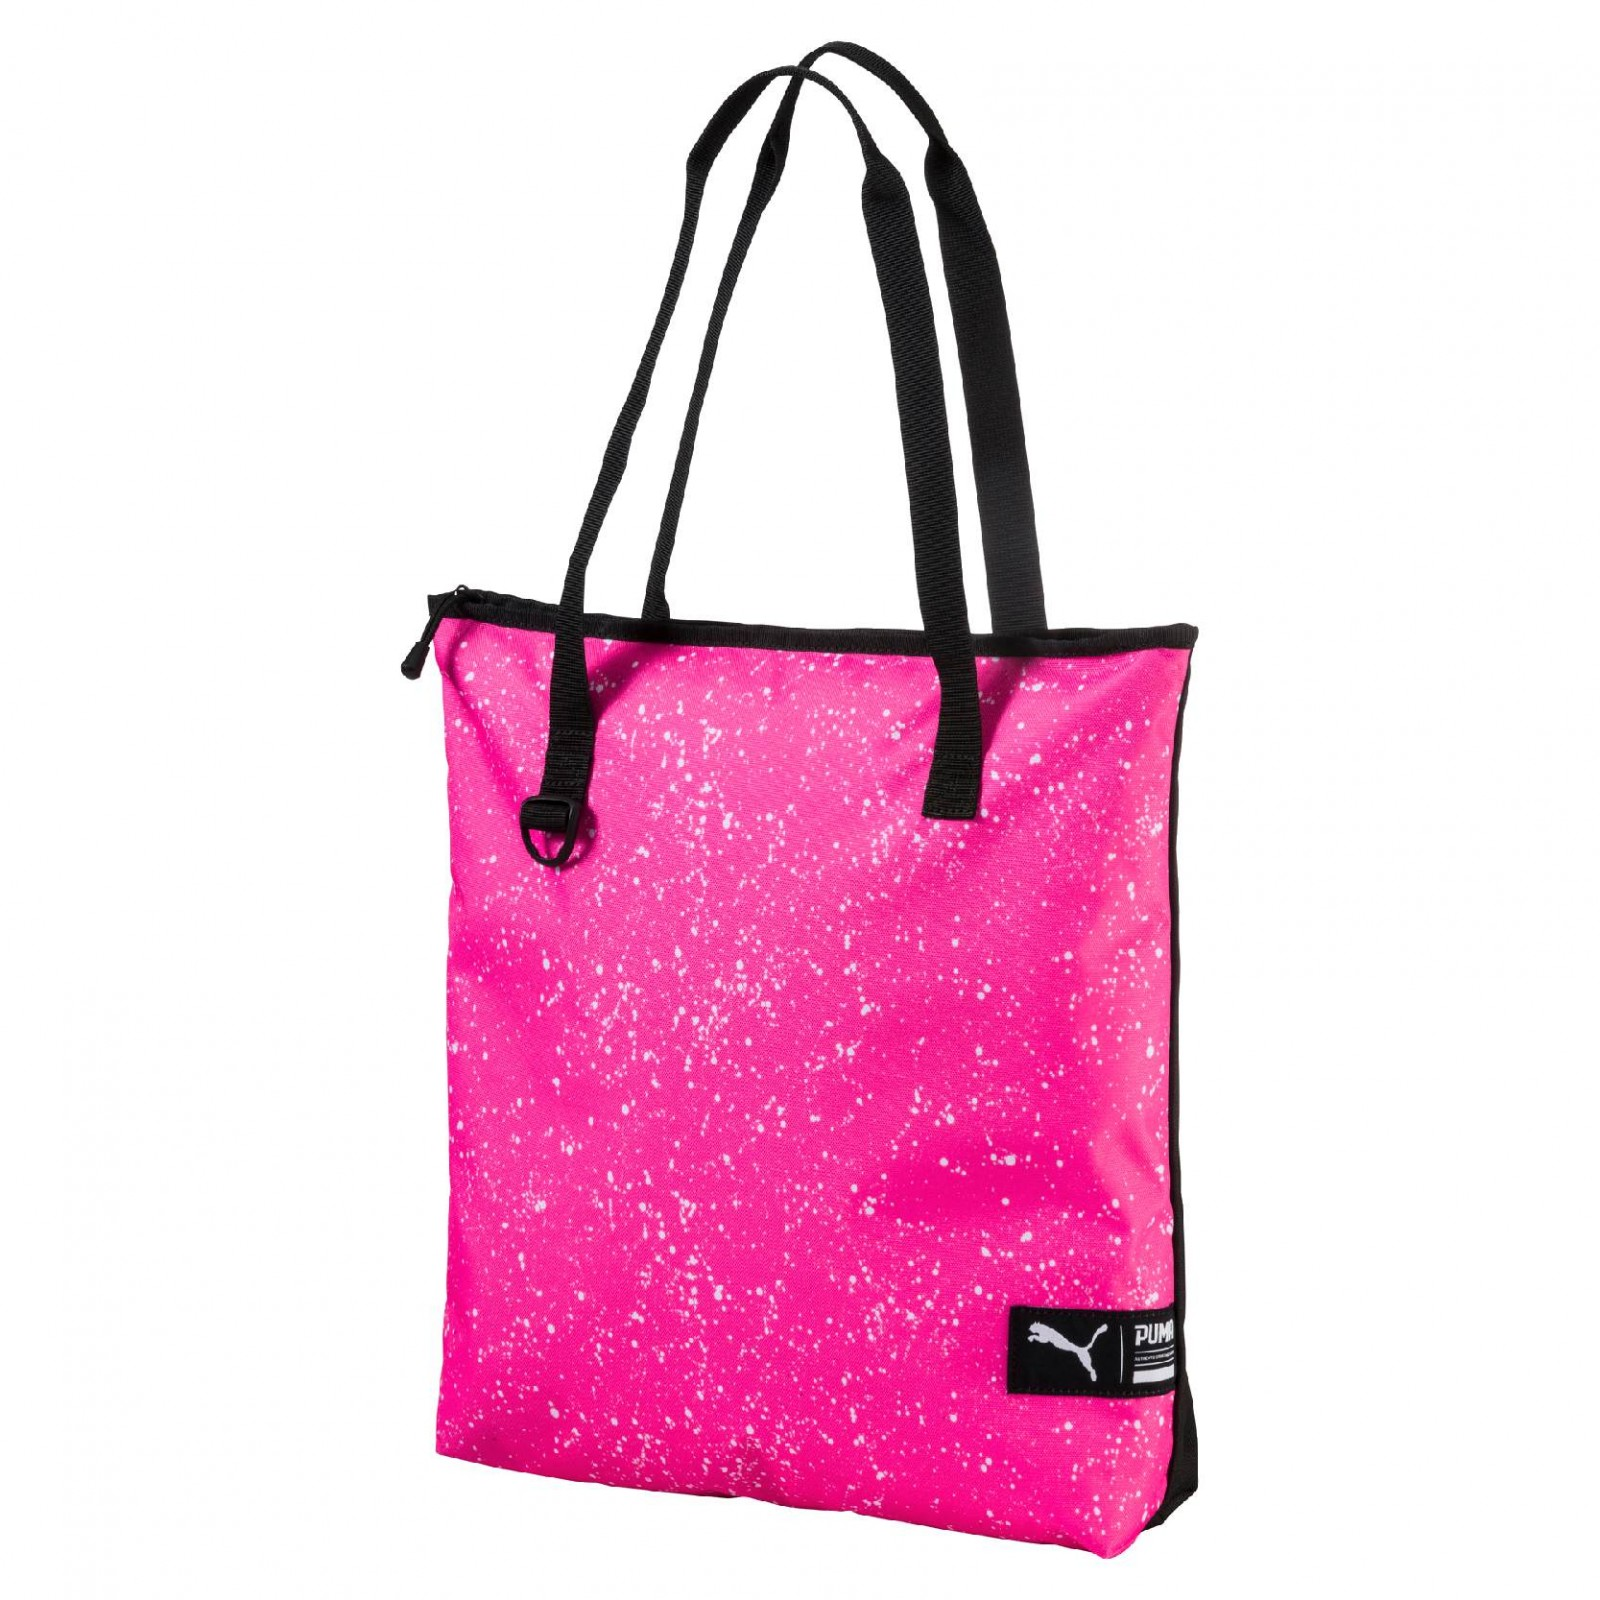 a6b244b09c Dámská taška Puma Fundamental Shopper II